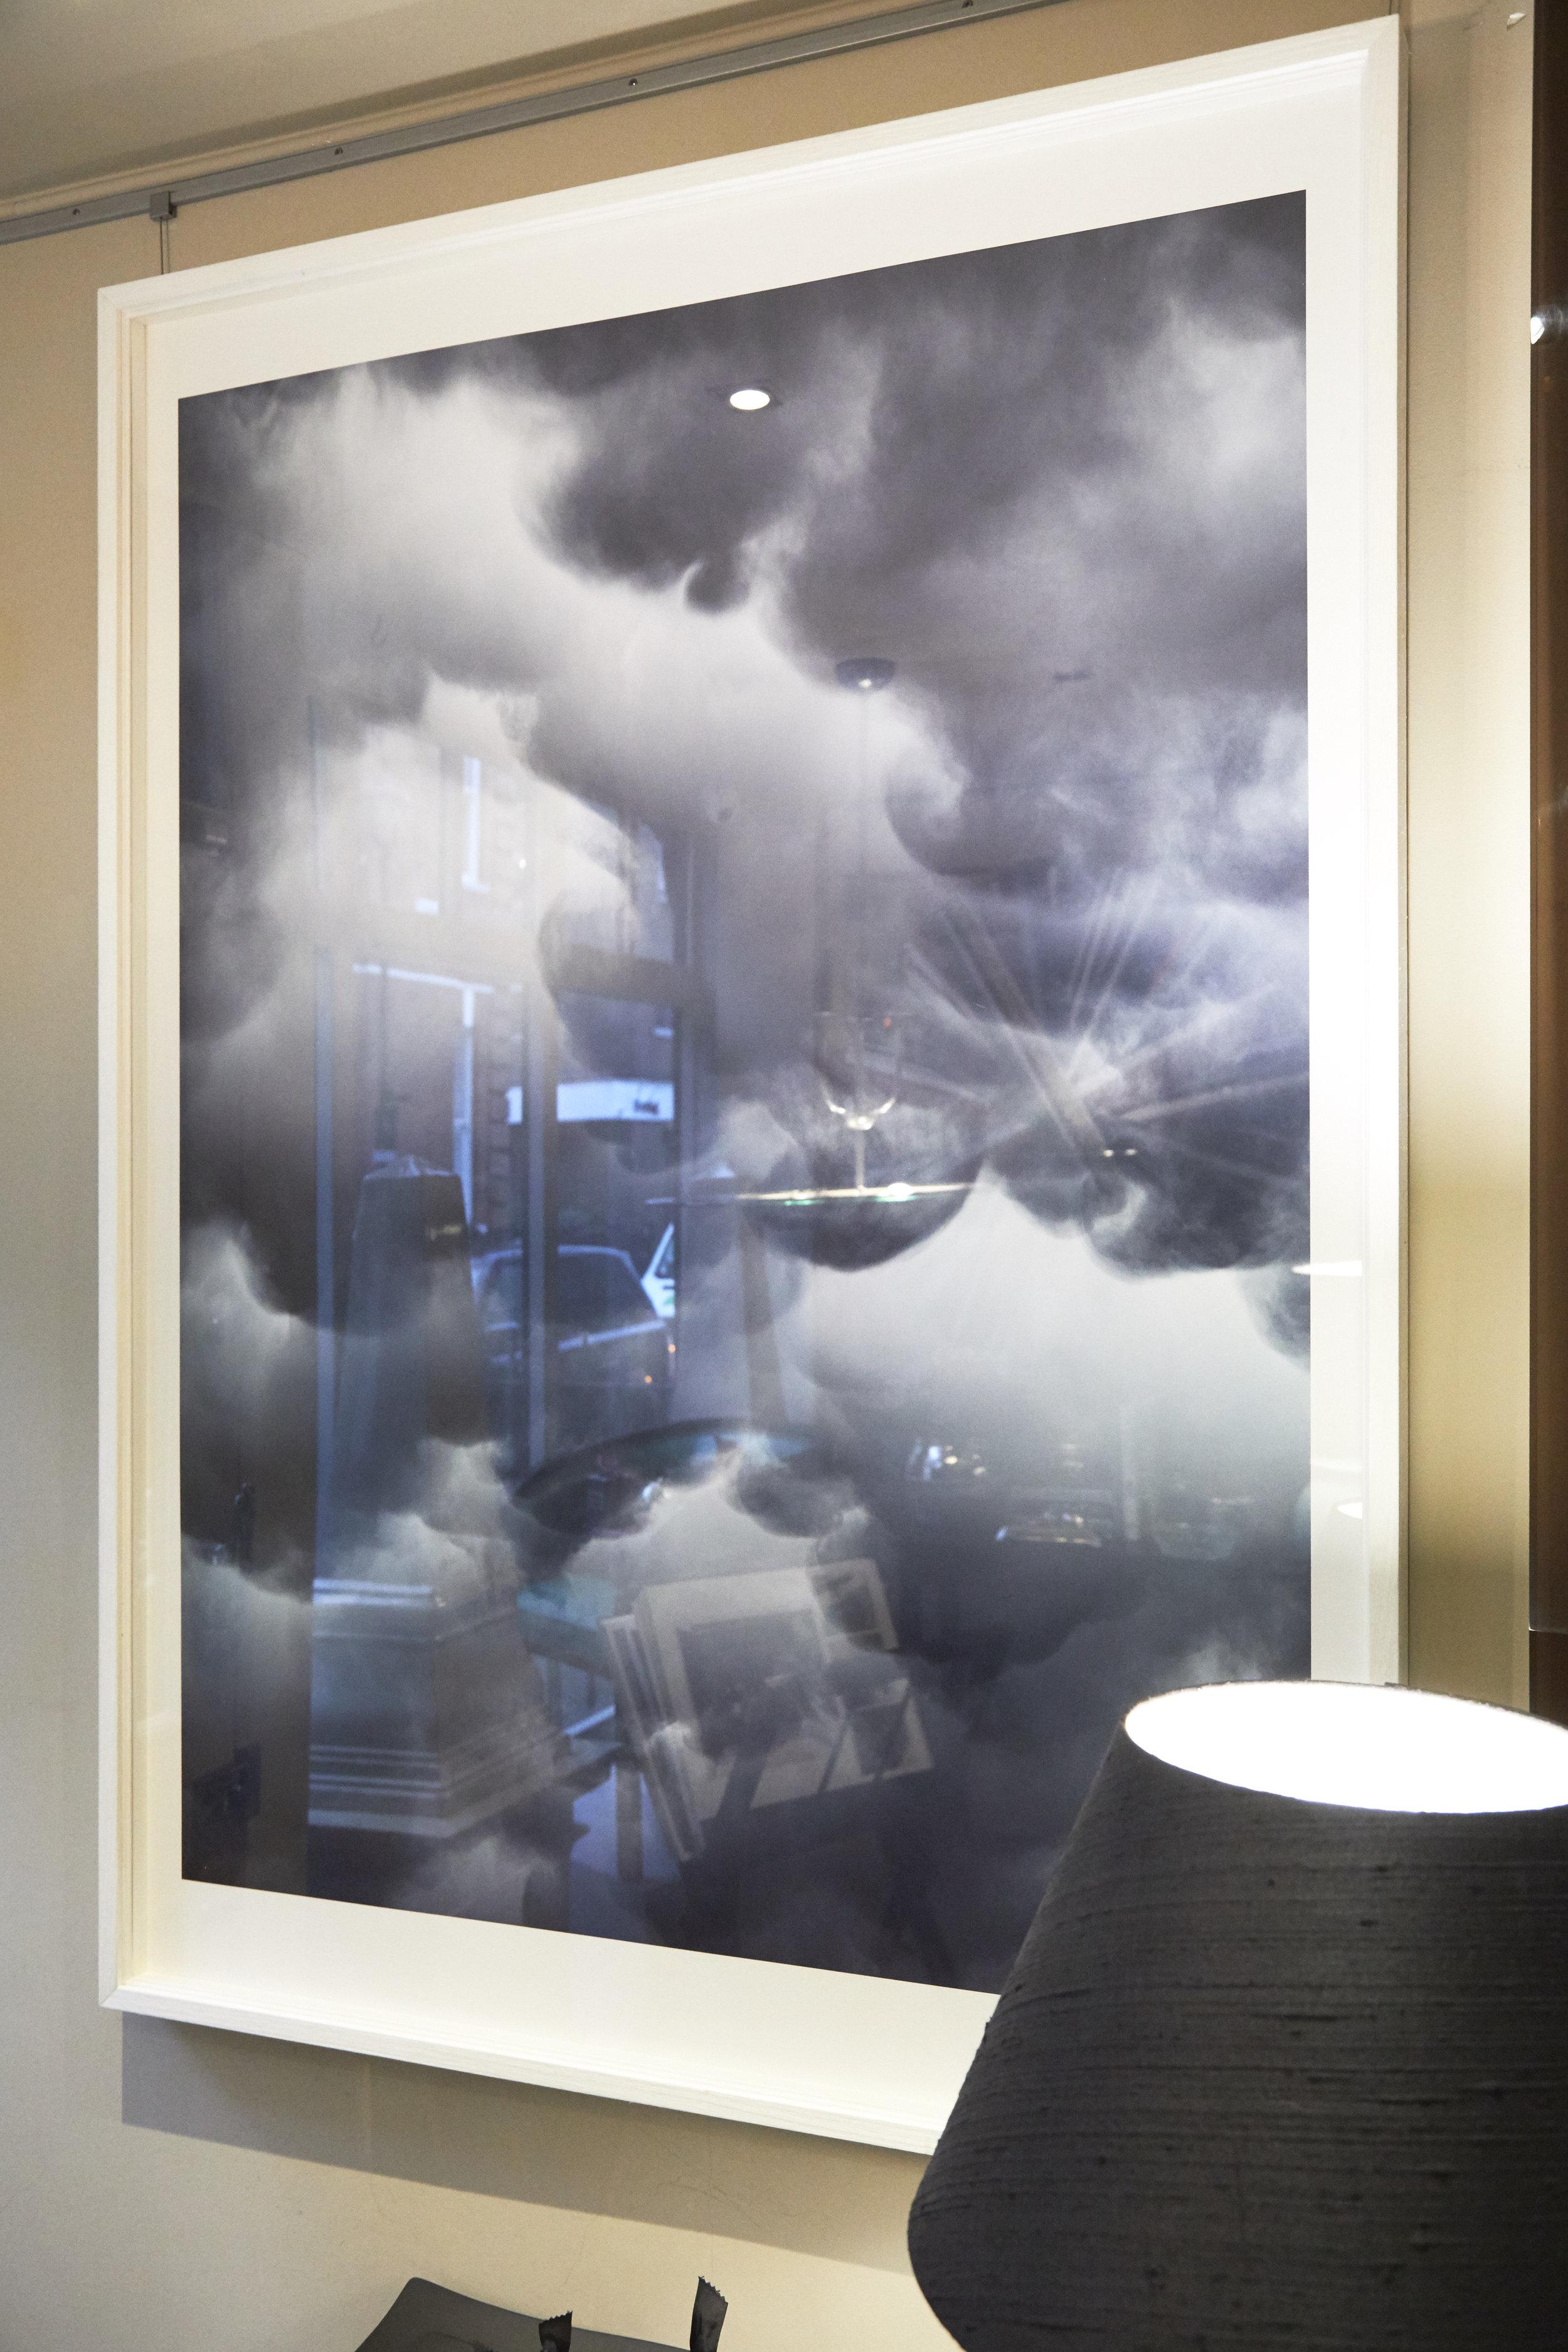 Trevor Mein, Saturdaytentwentyeight2010 - Pigment print on cotton ragLimited edition of 25In a white box frame with acrylic glazing157cm x 115cm